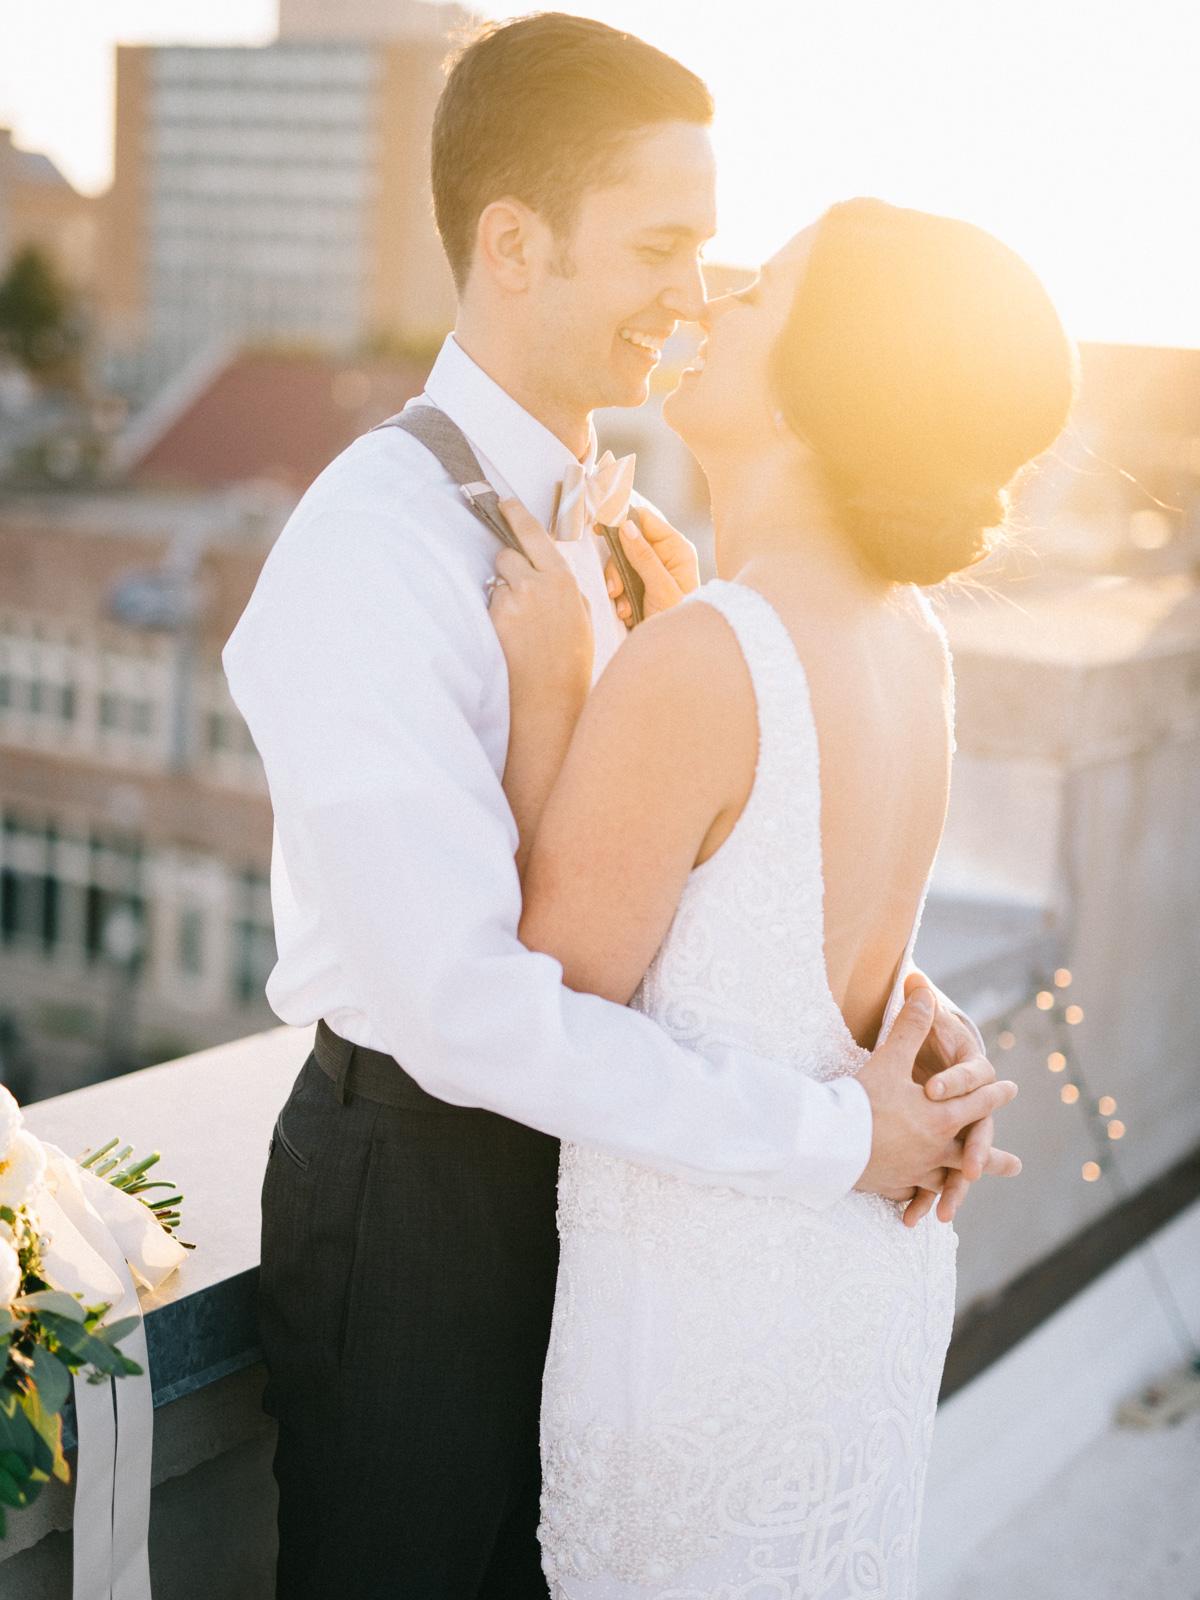 OKC rooftop wedding josh mccullock-6868.jpg